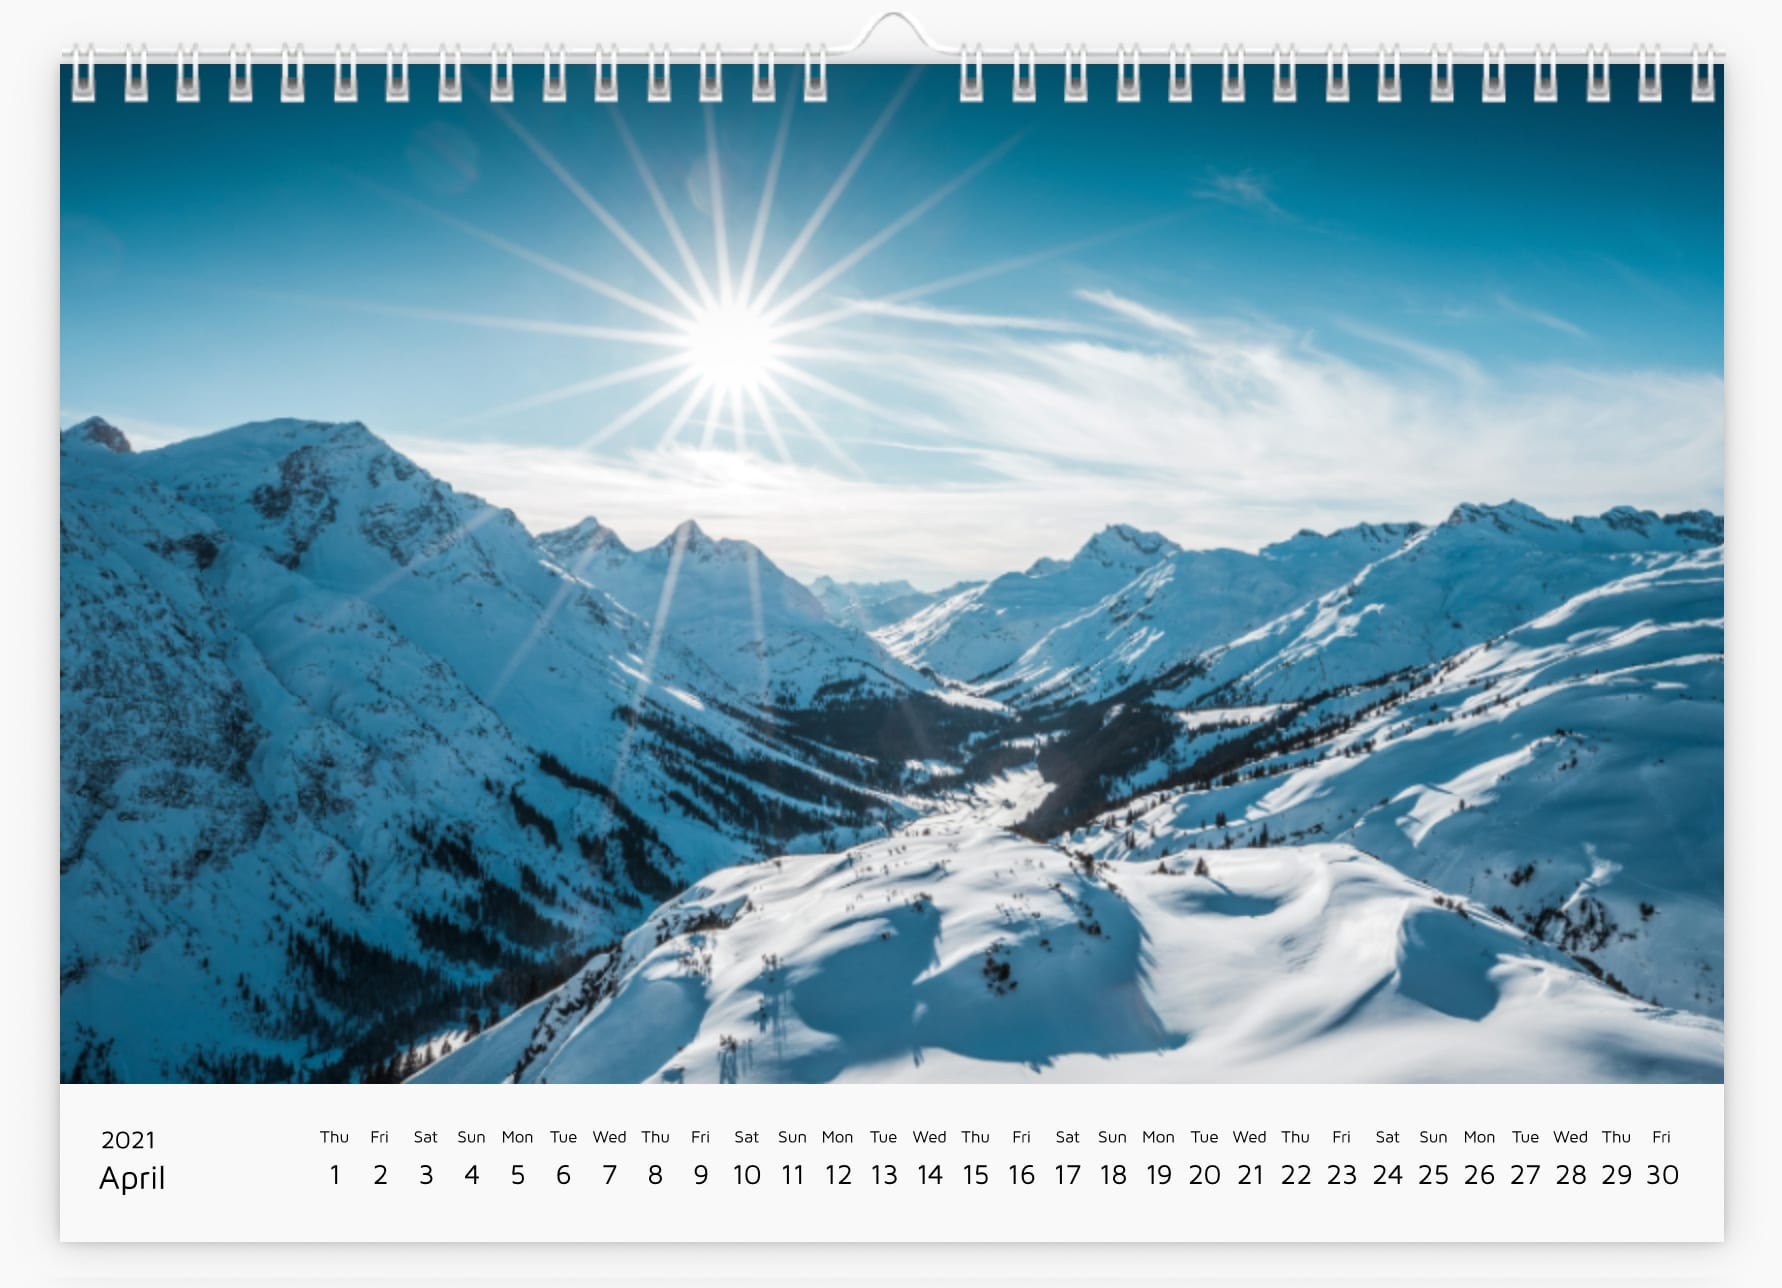 April - Calendar 2021